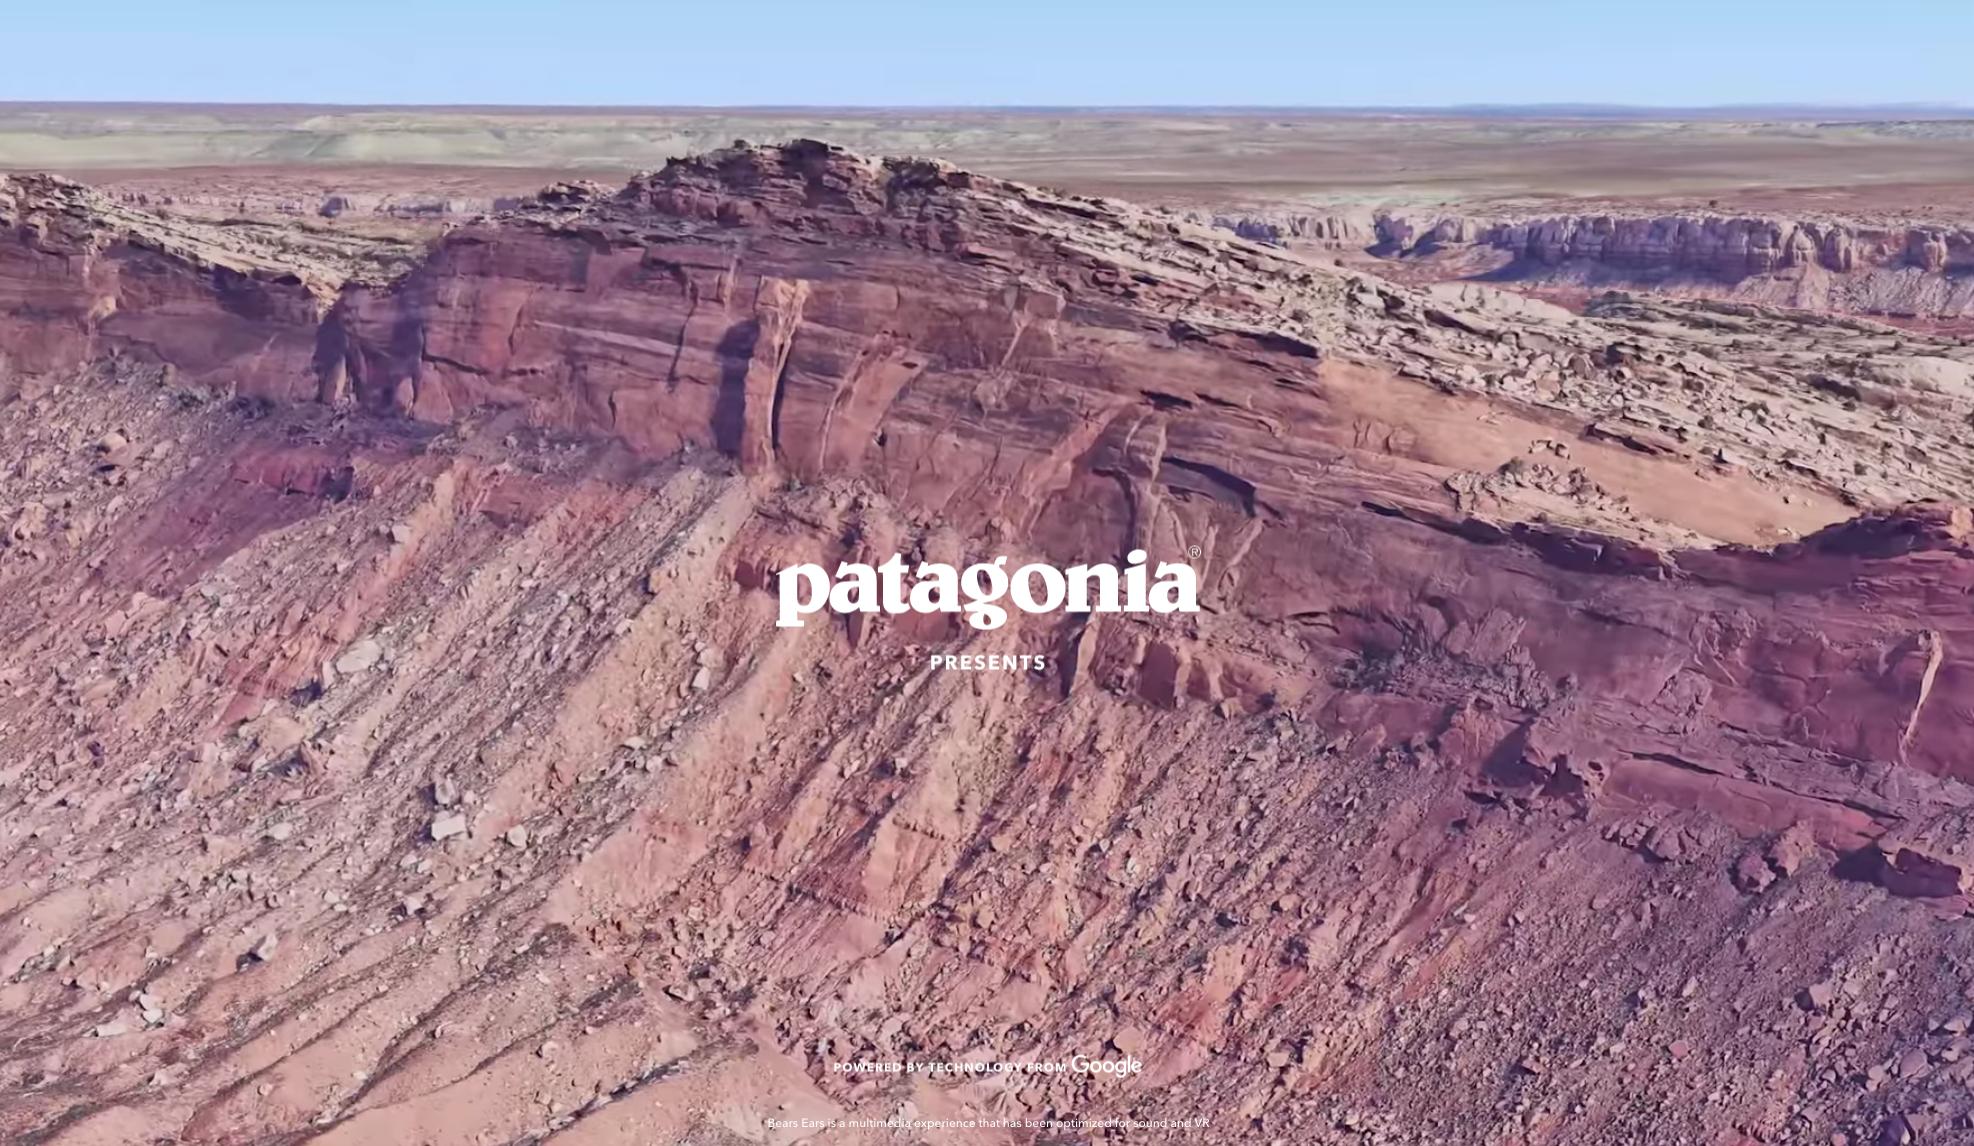 patagonia video link